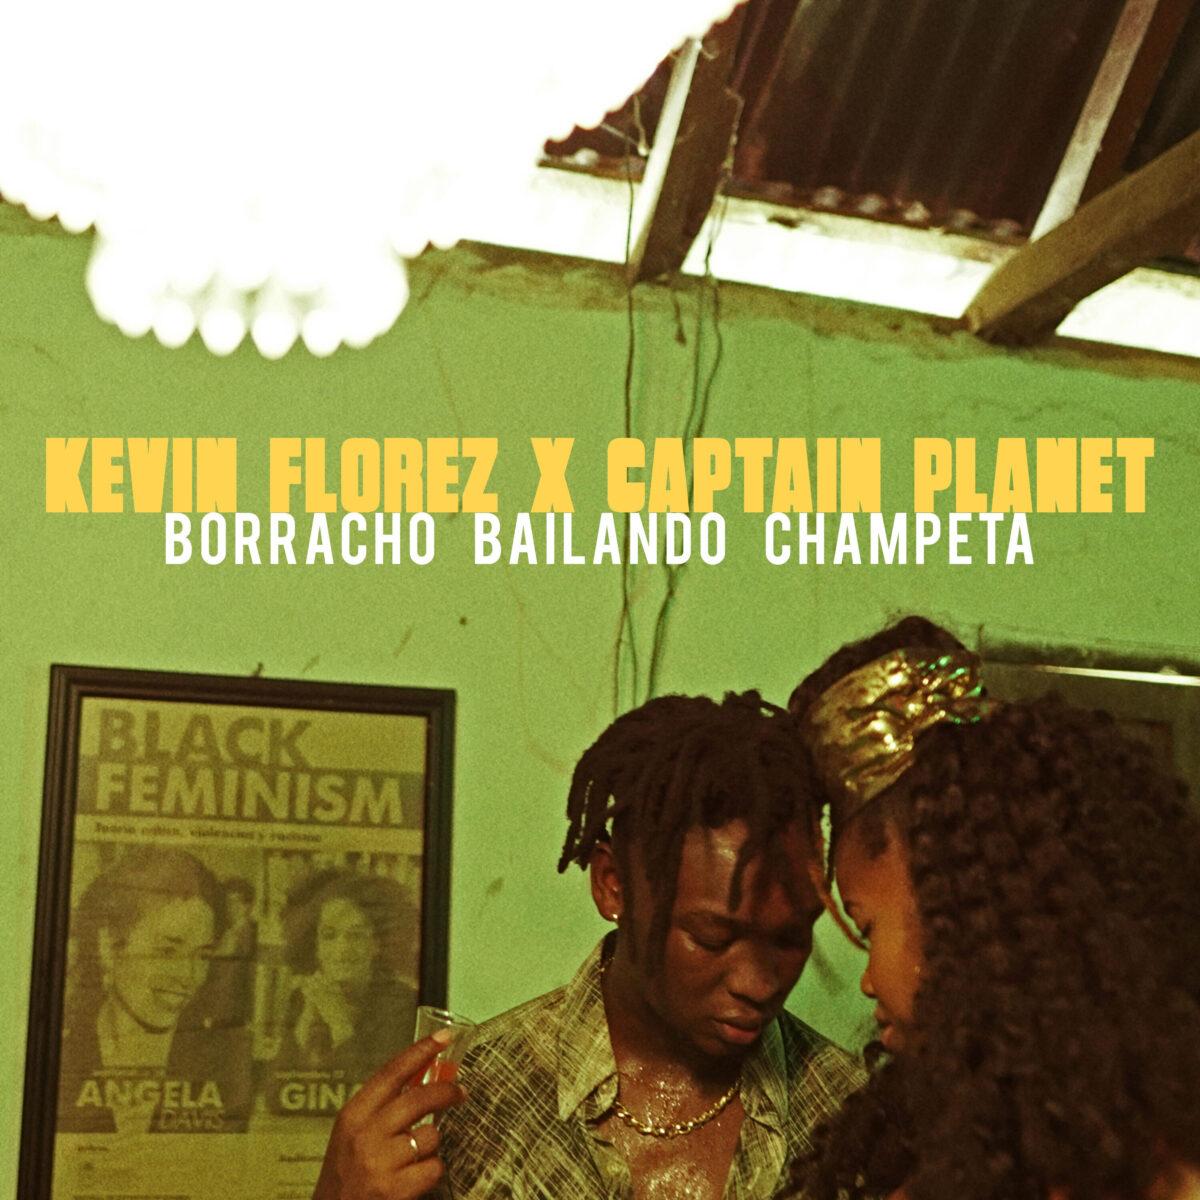 kevin florez presenta borracho bailando champeta unnamed 3